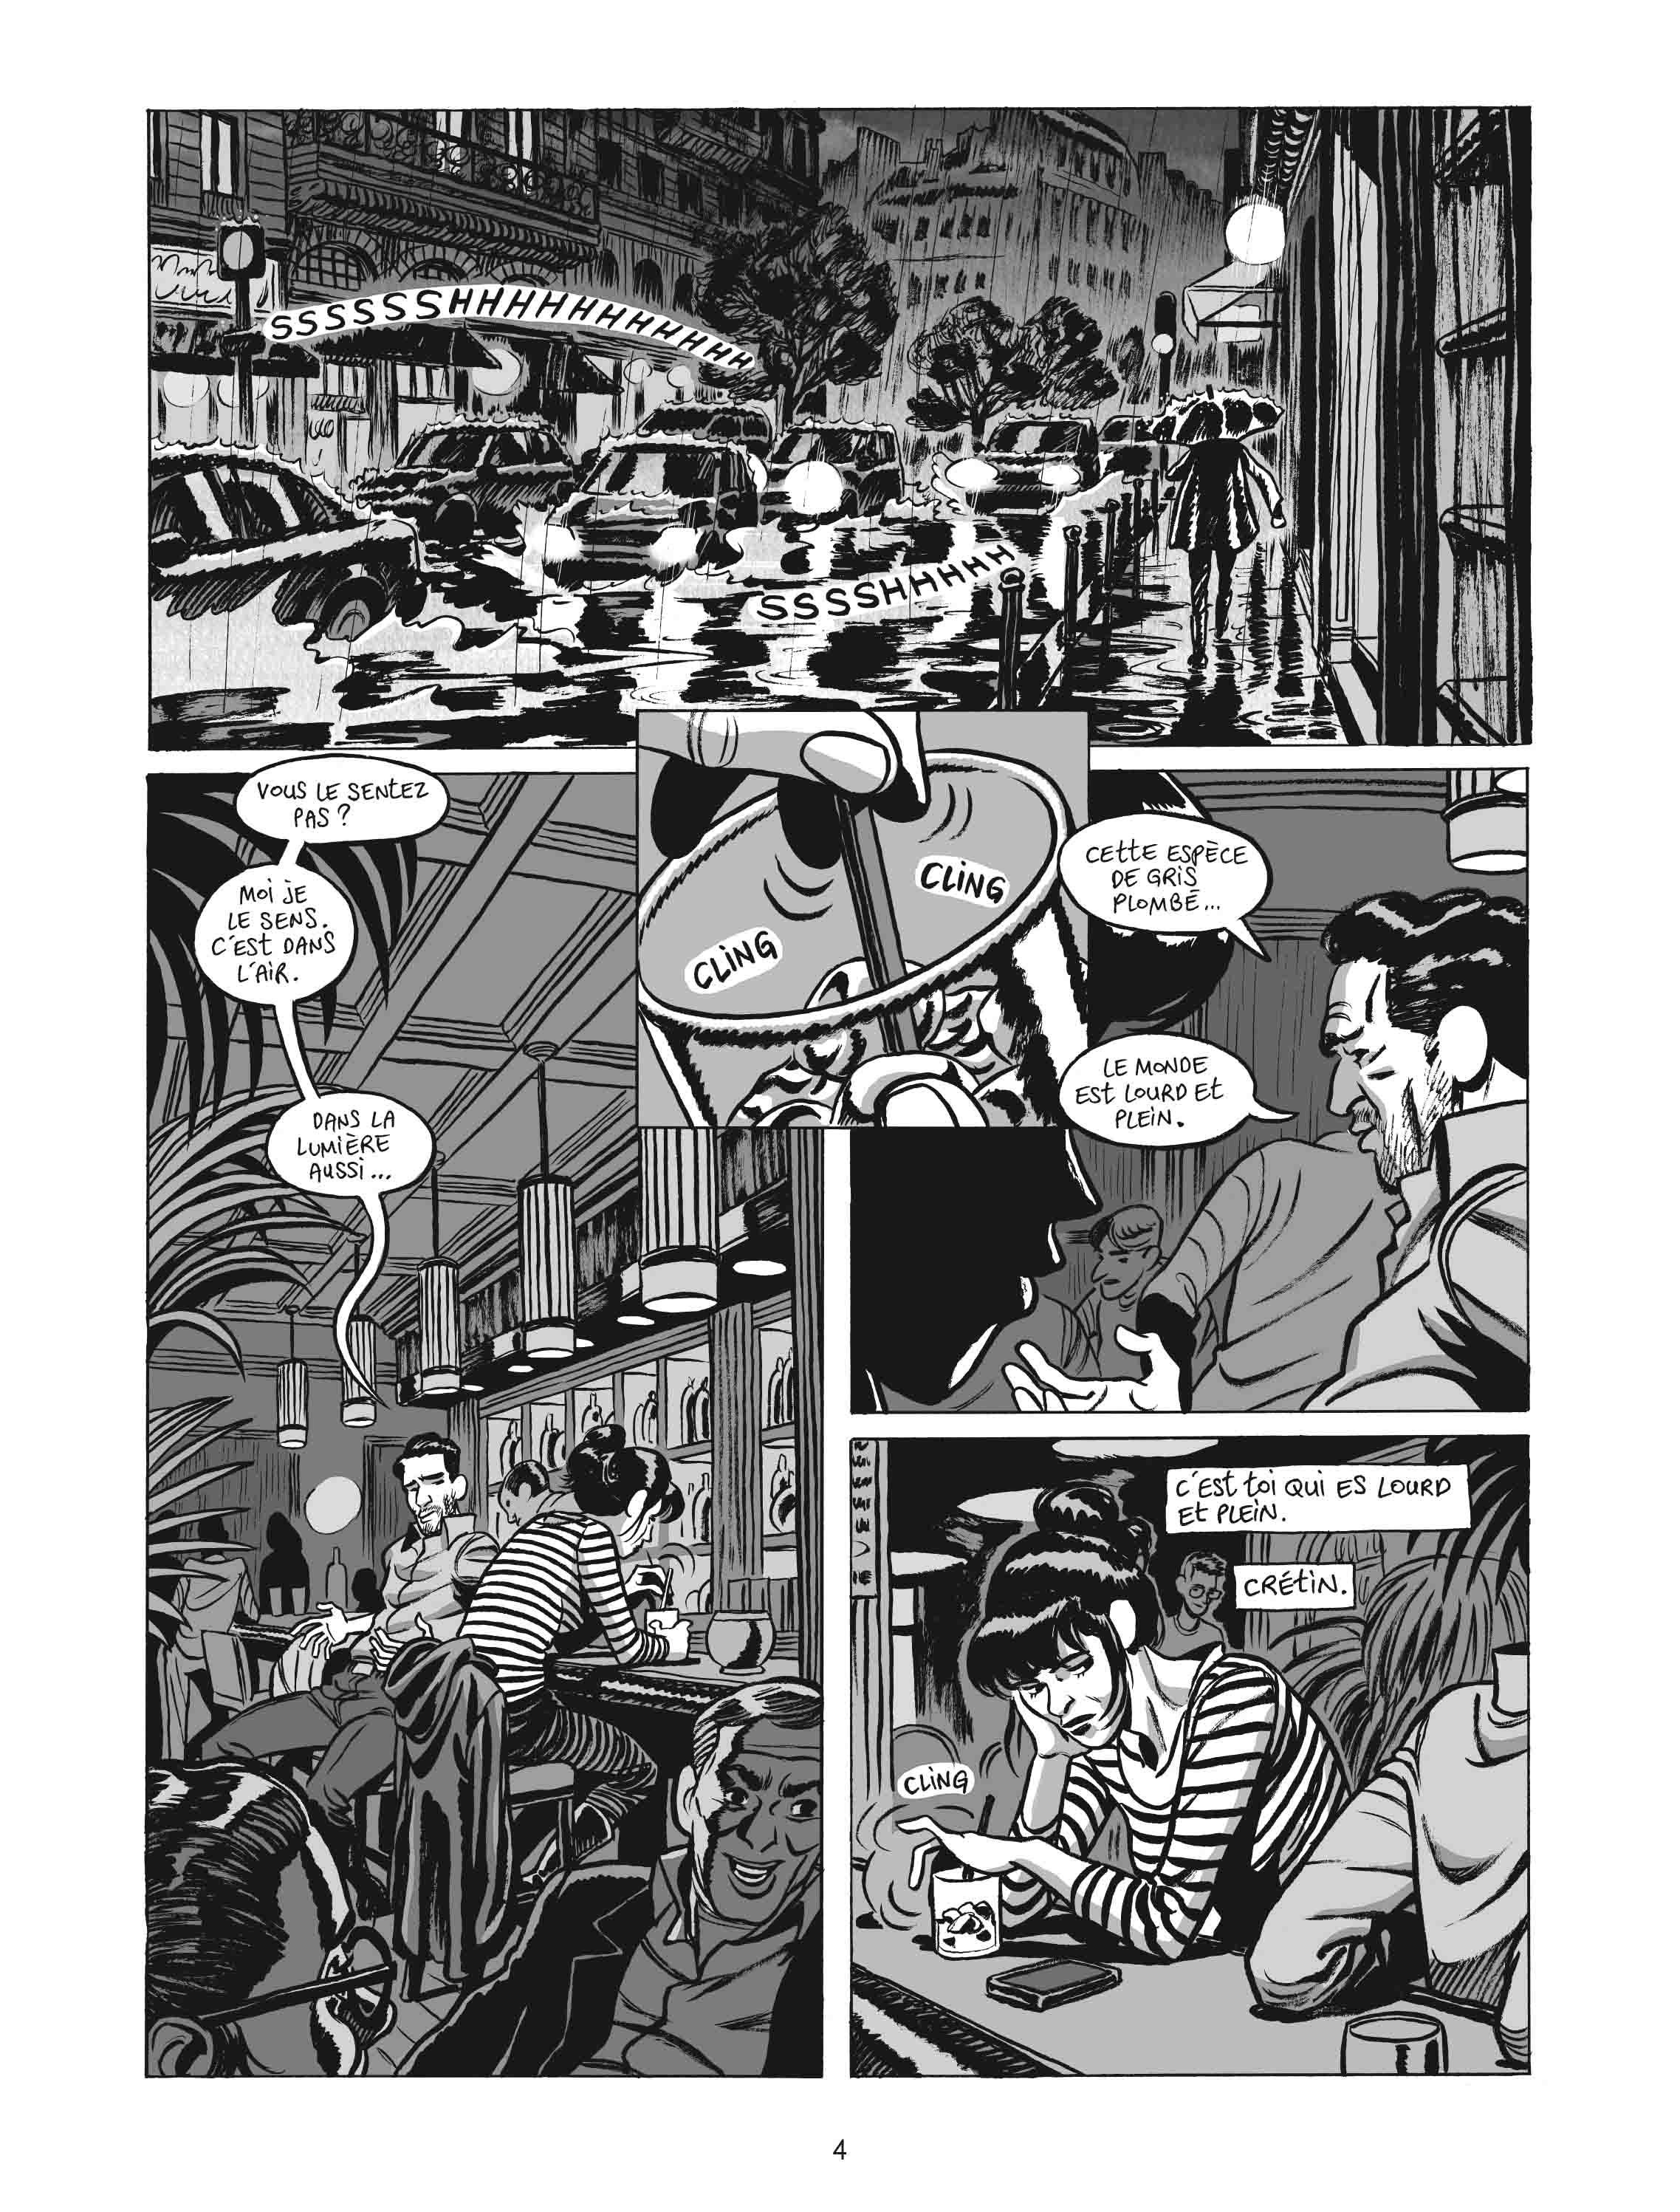 L'Homme gribouillé – Serge Lehman & Frederik Peeters